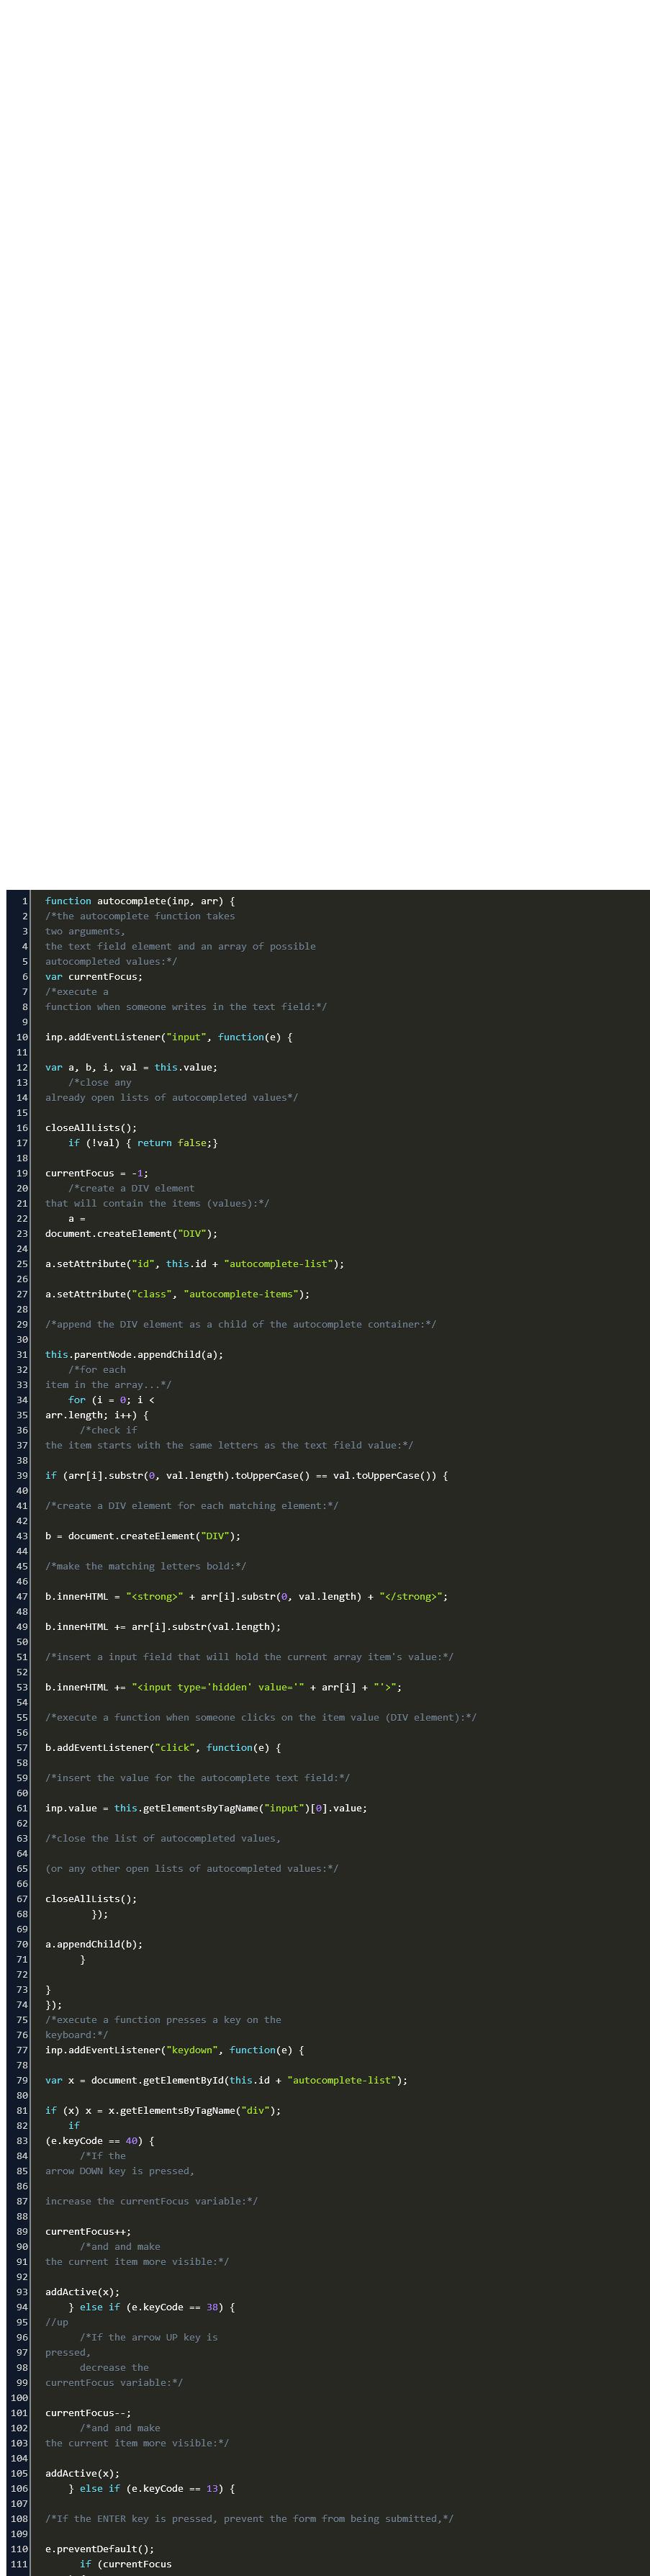 jquery ui widget factory setoptions binary